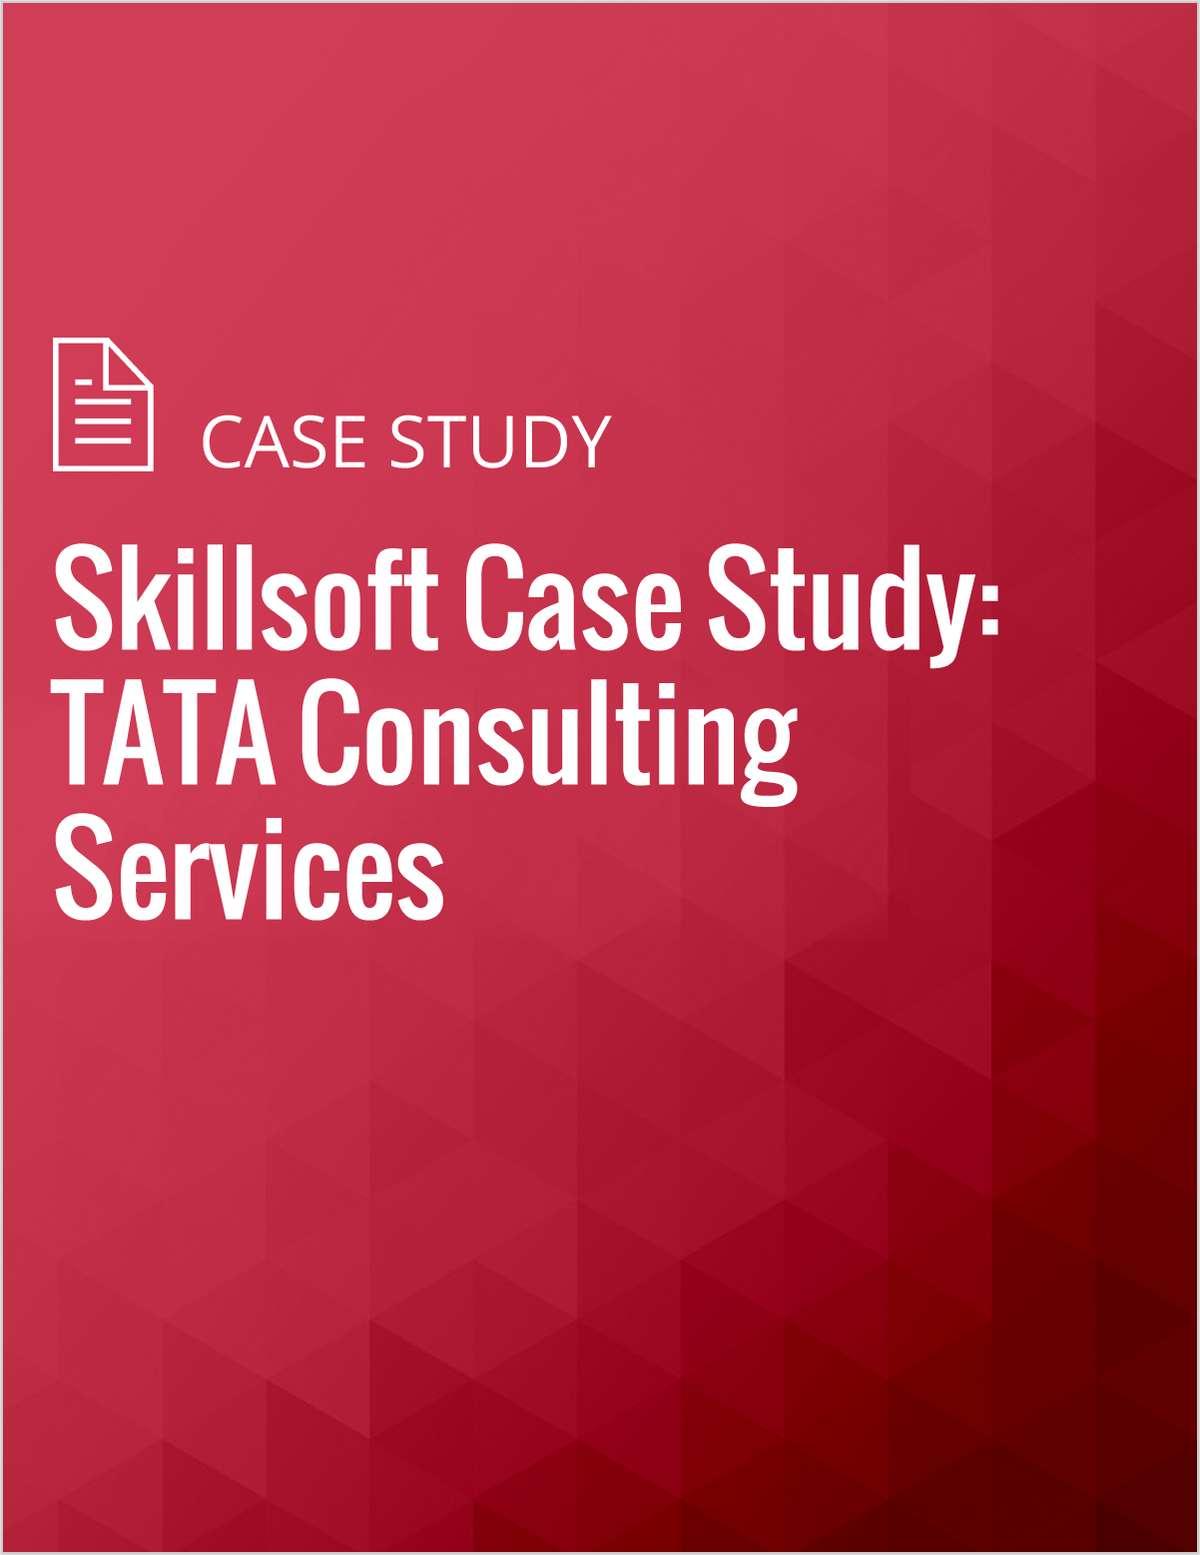 Skillsoft Case Study: TATA Consulting Services